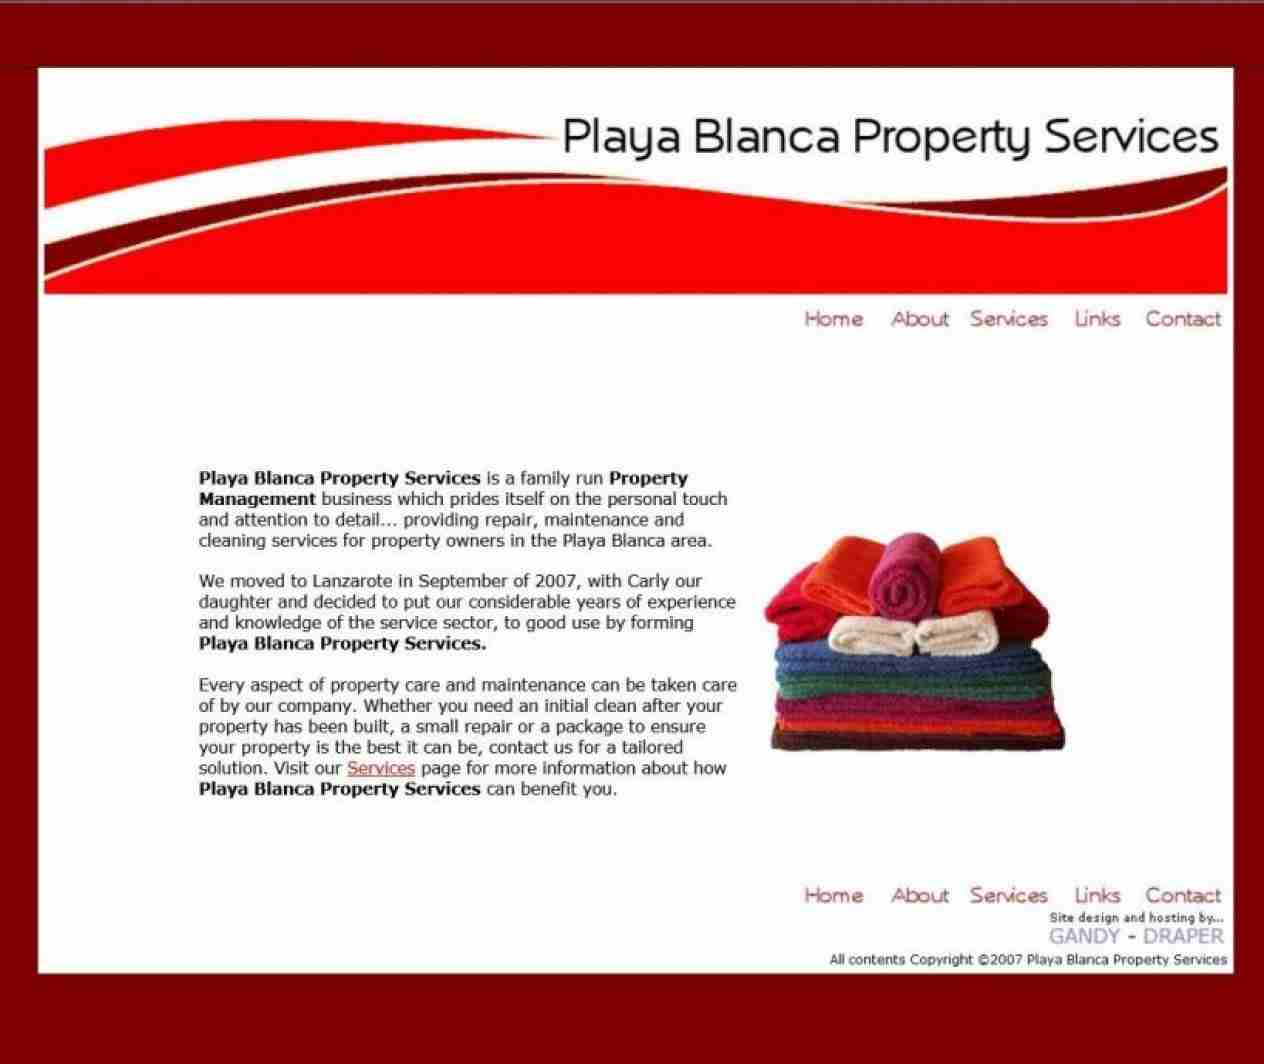 Playa Blanca Property Services